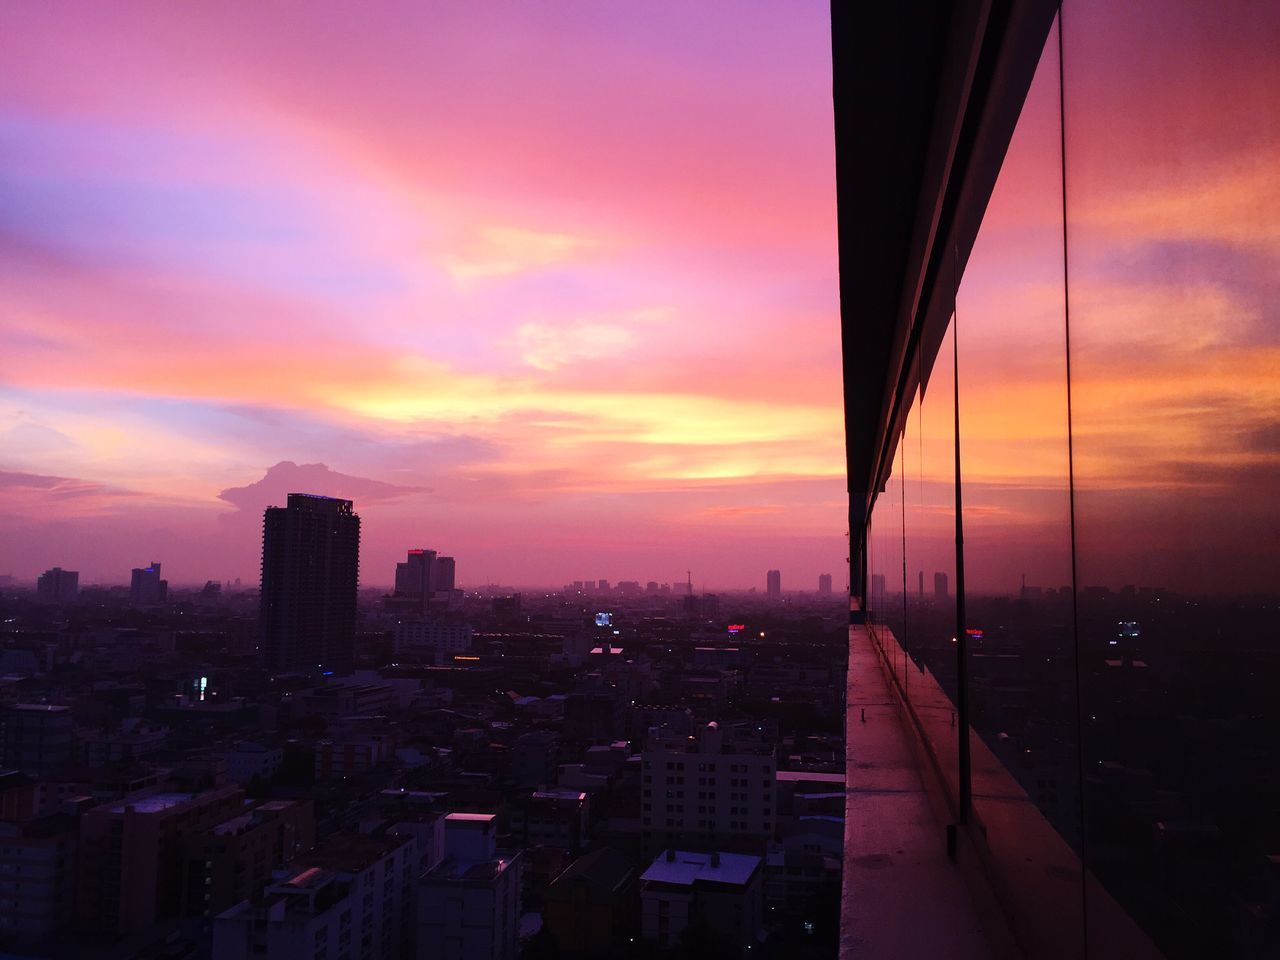 sunset, architecture, building exterior, city, built structure, sky, skyscraper, orange color, cityscape, cloud - sky, no people, city life, outdoors, modern, urban skyline, travel destinations, nature, day